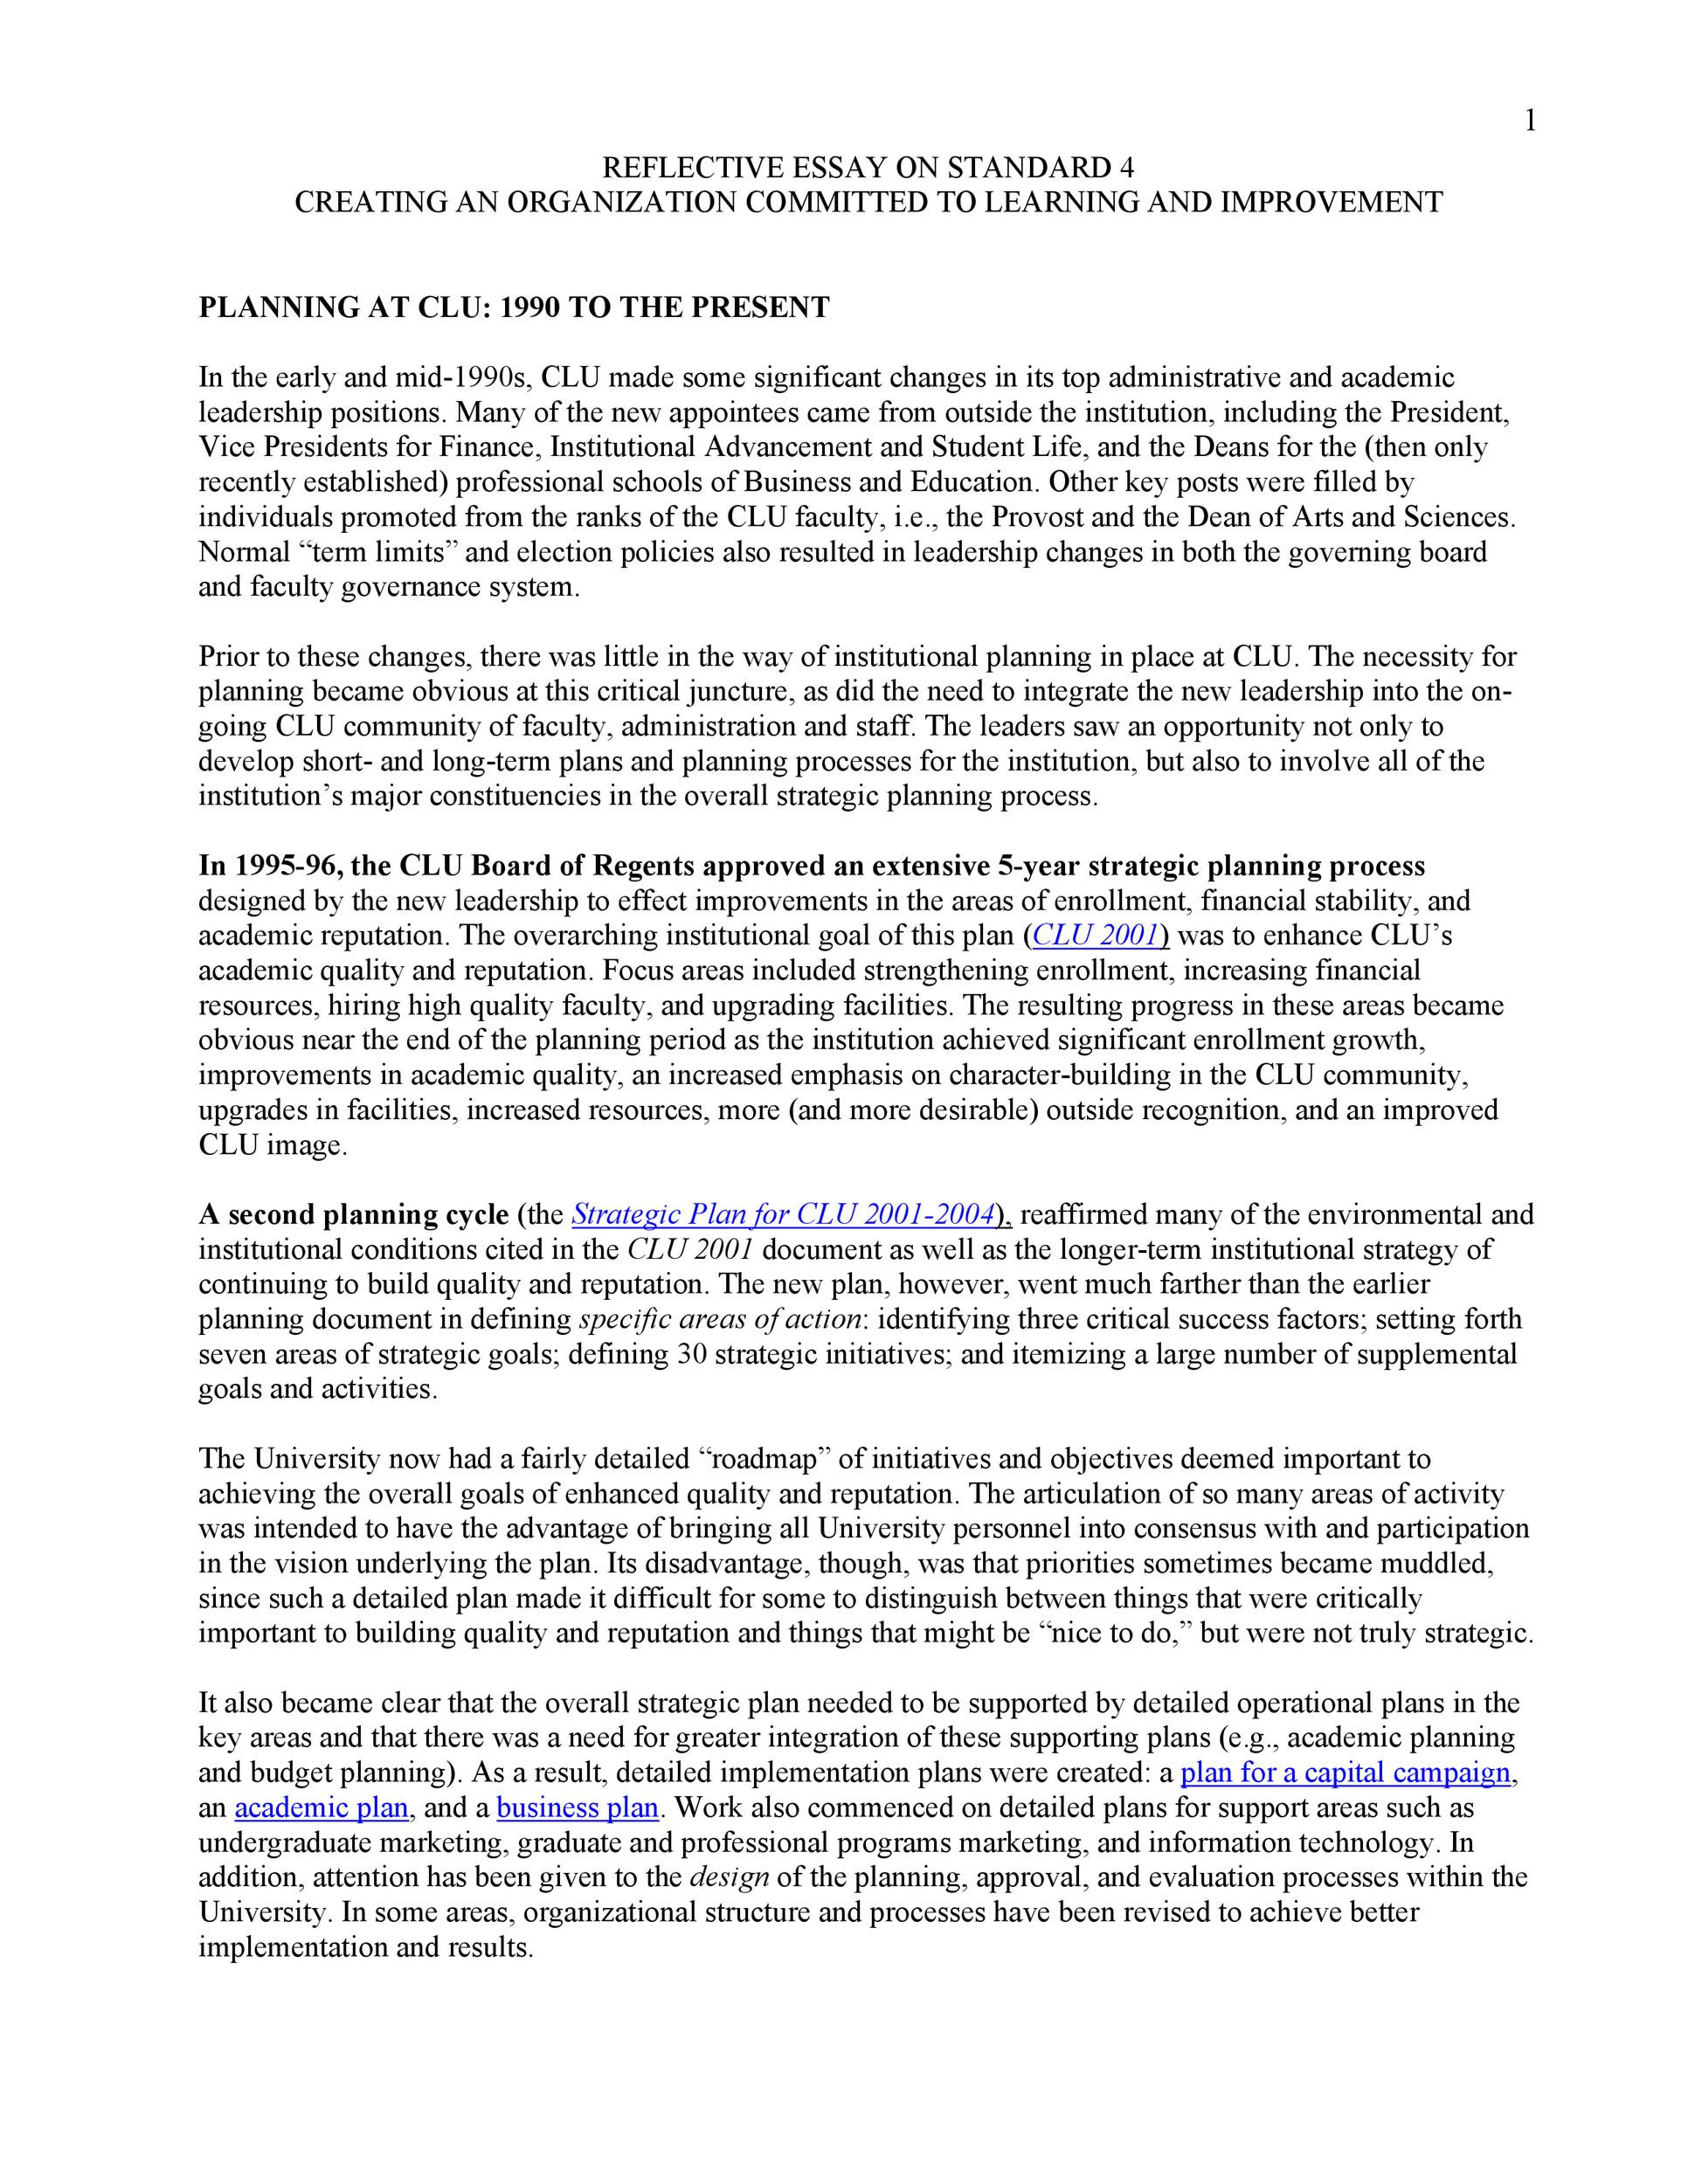 Free reflective essay example 31